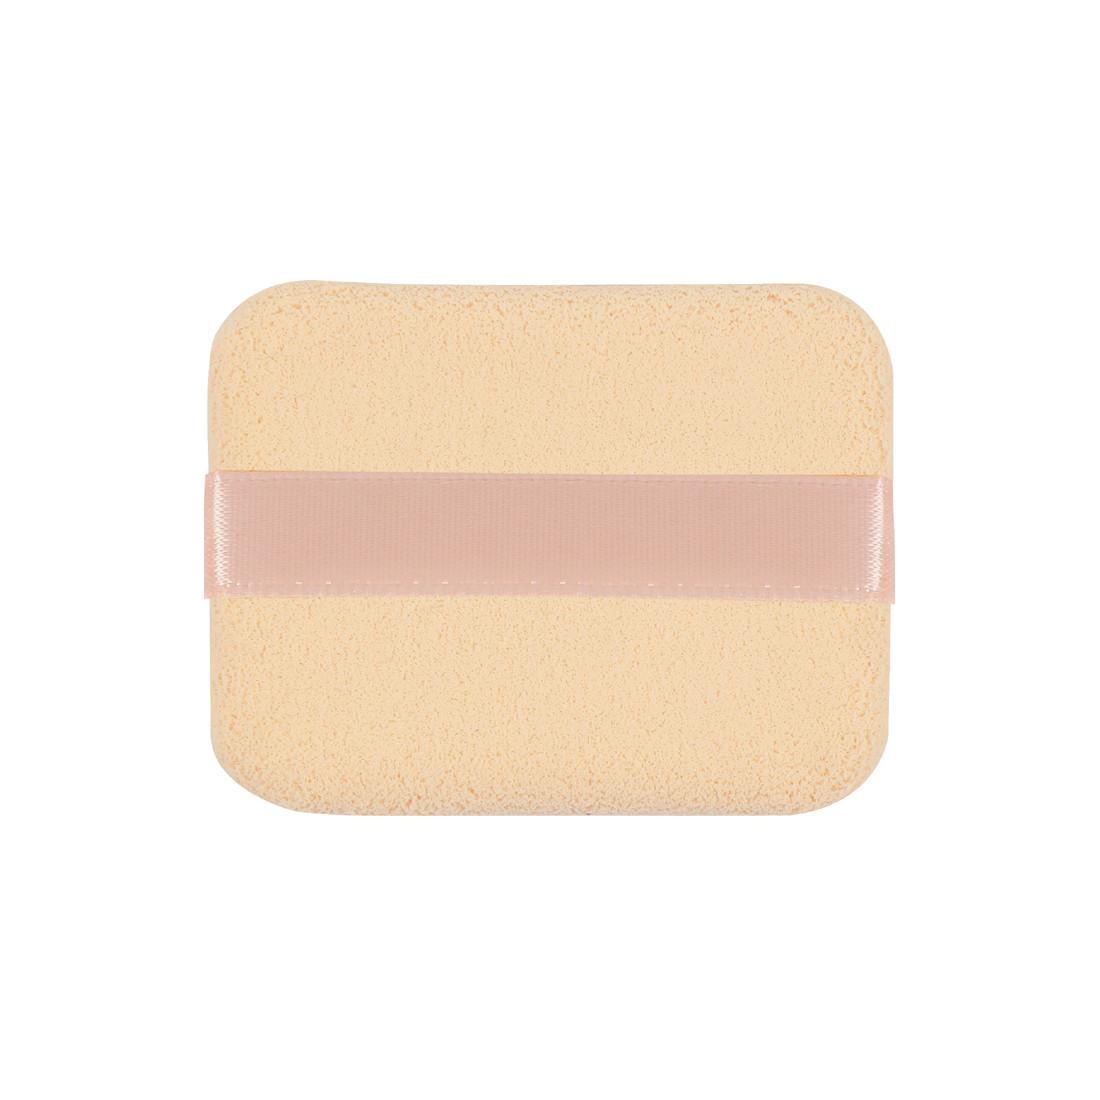 KAIV Make Up Sponge - Rectangle